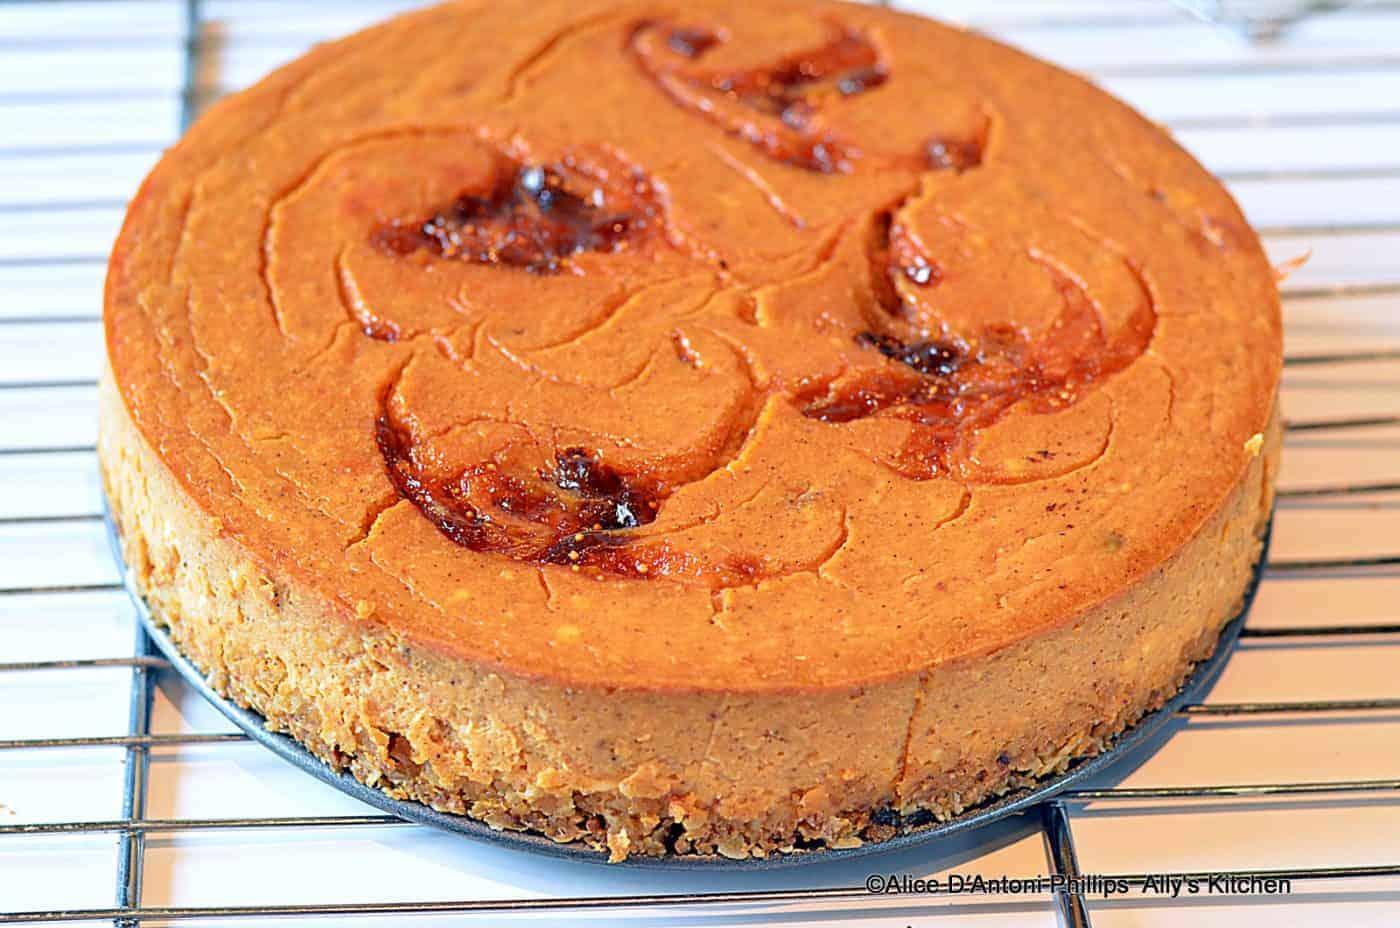 Trail Mix Sweet Potato & Pineapple Cheesecake